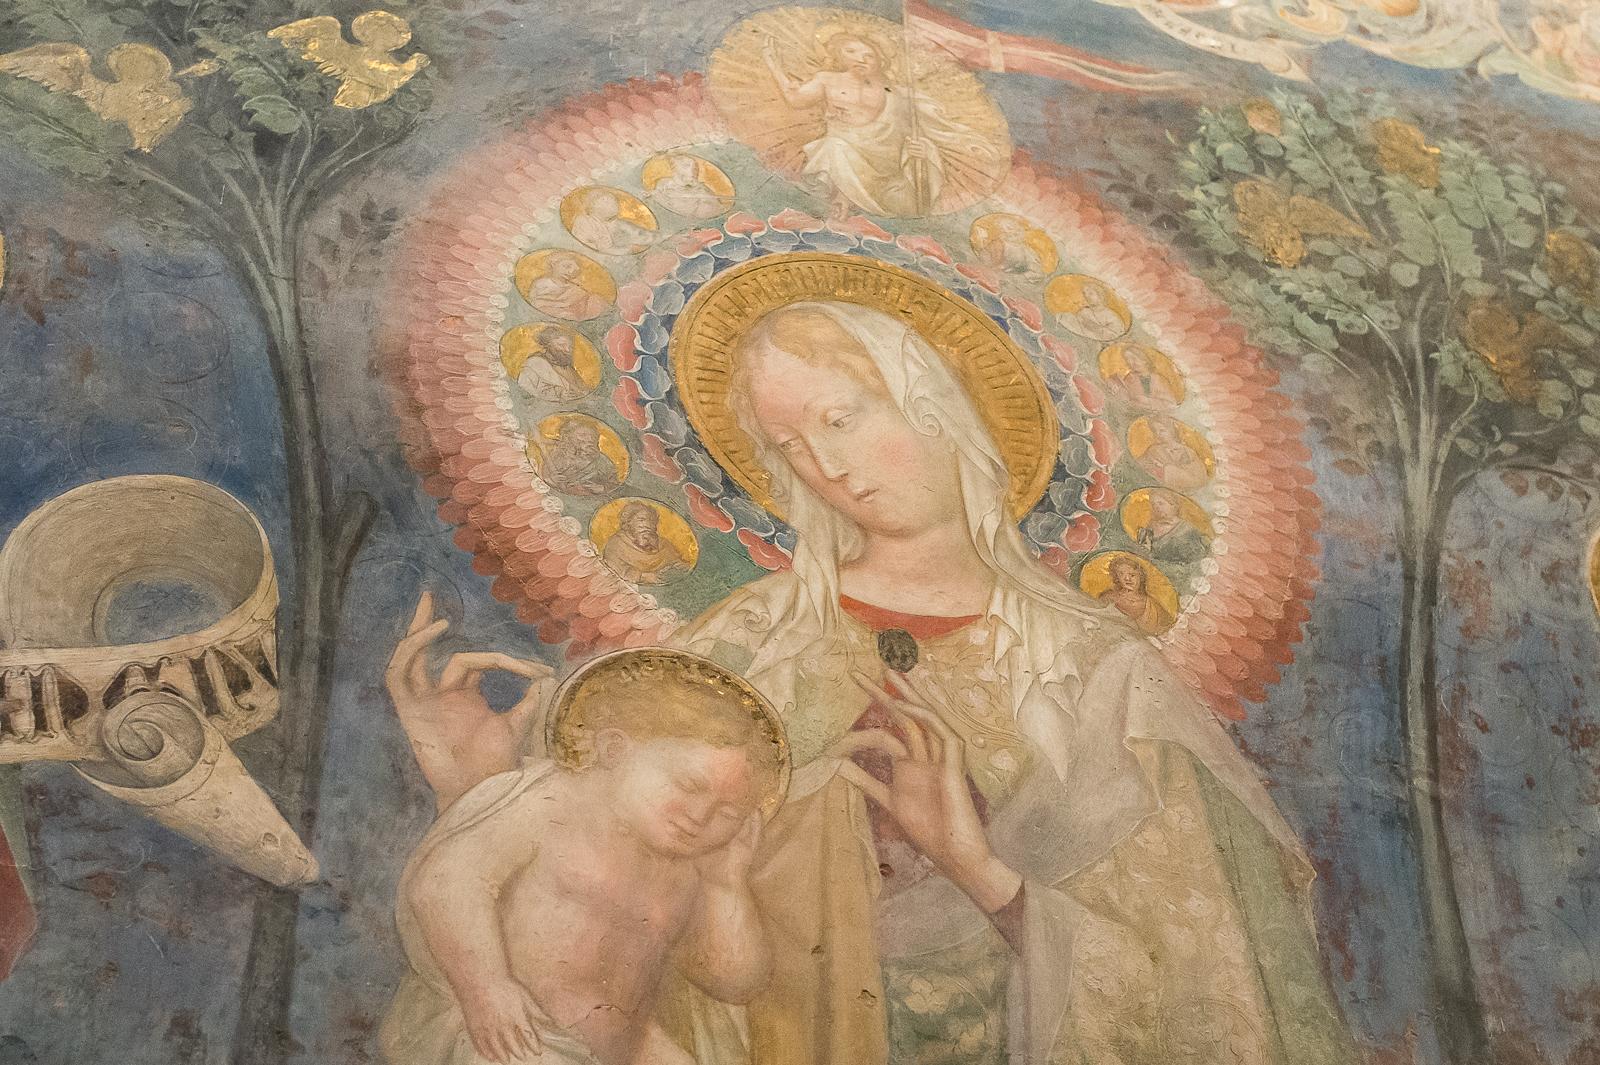 Oratorio San Giovanni (detail)